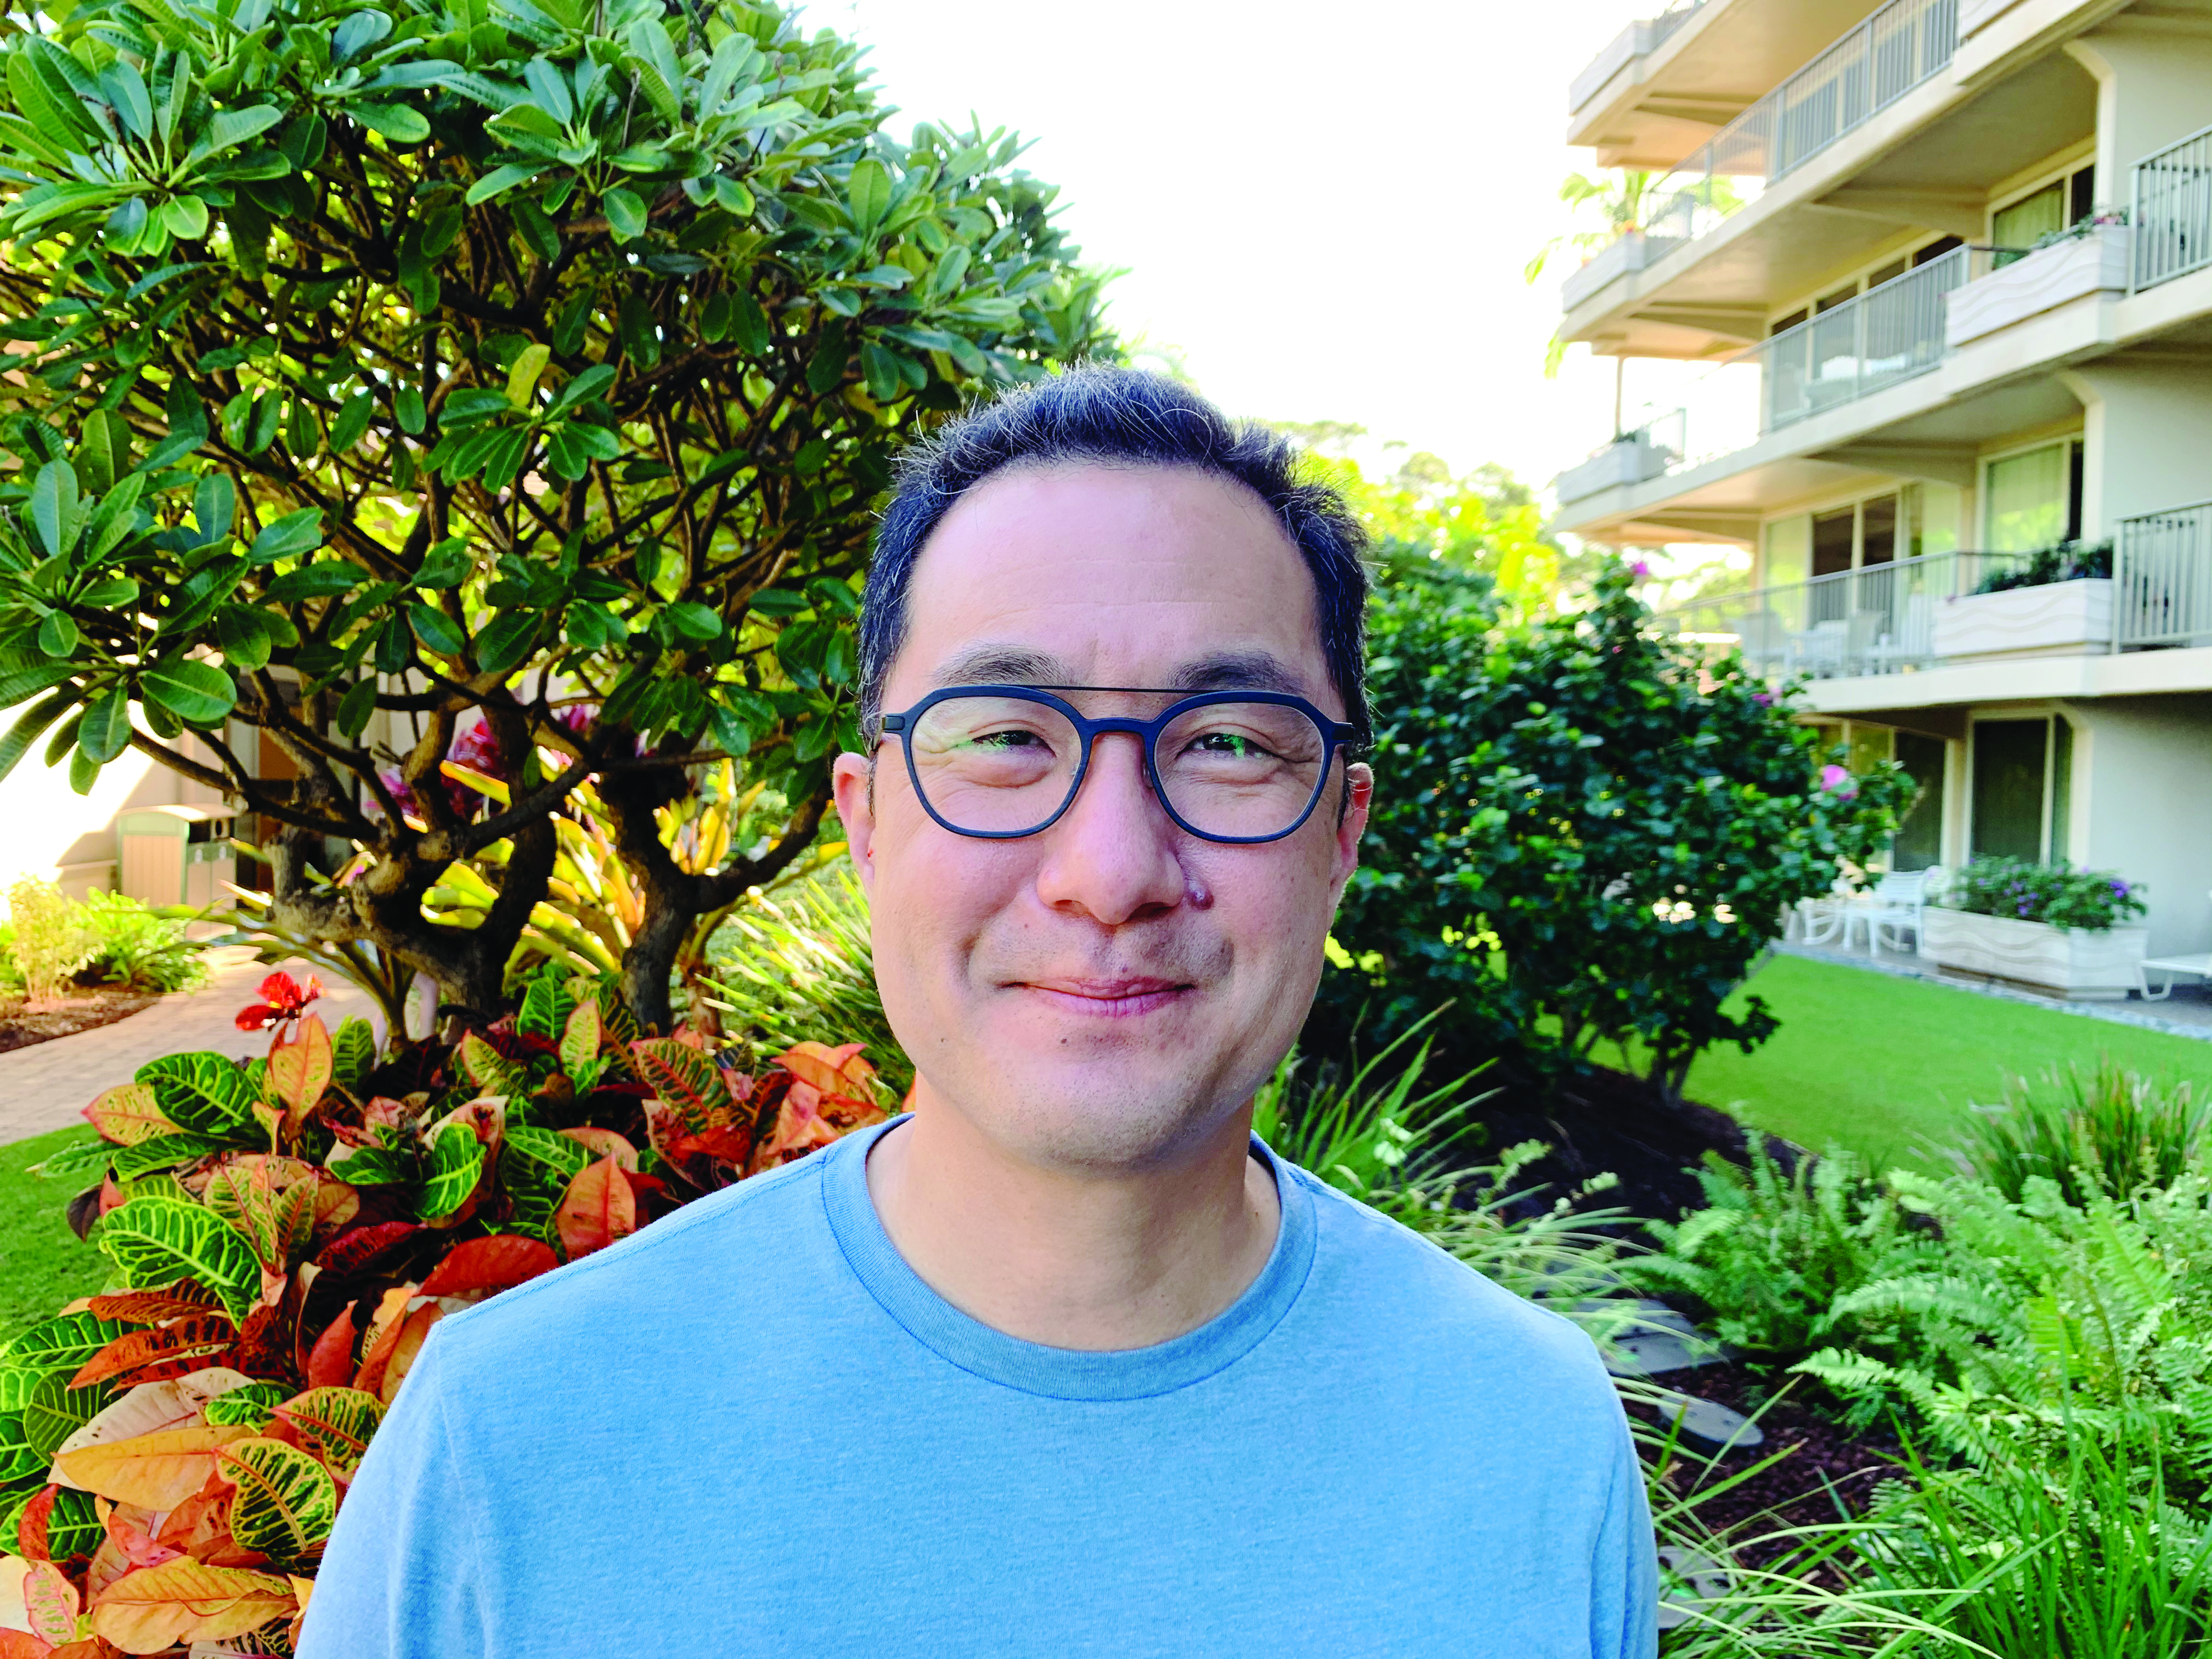 Howard Chung